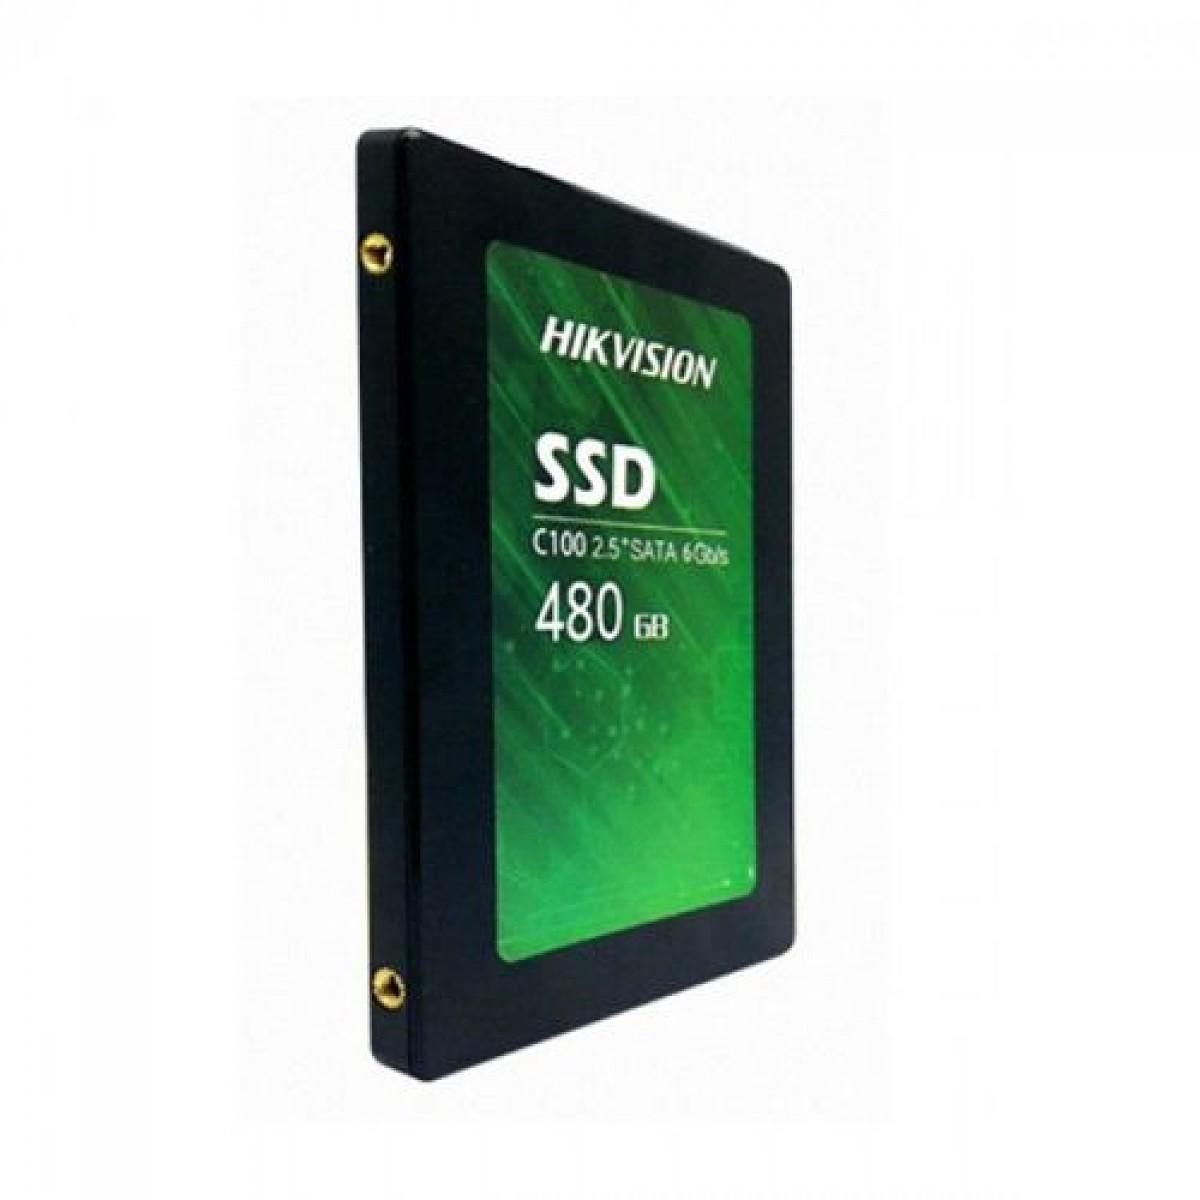 SSD Hikvision C100, 480GB, Sata III, Leitura 550MBs e Gravação 470MBs, HS-SSD-C100/480G